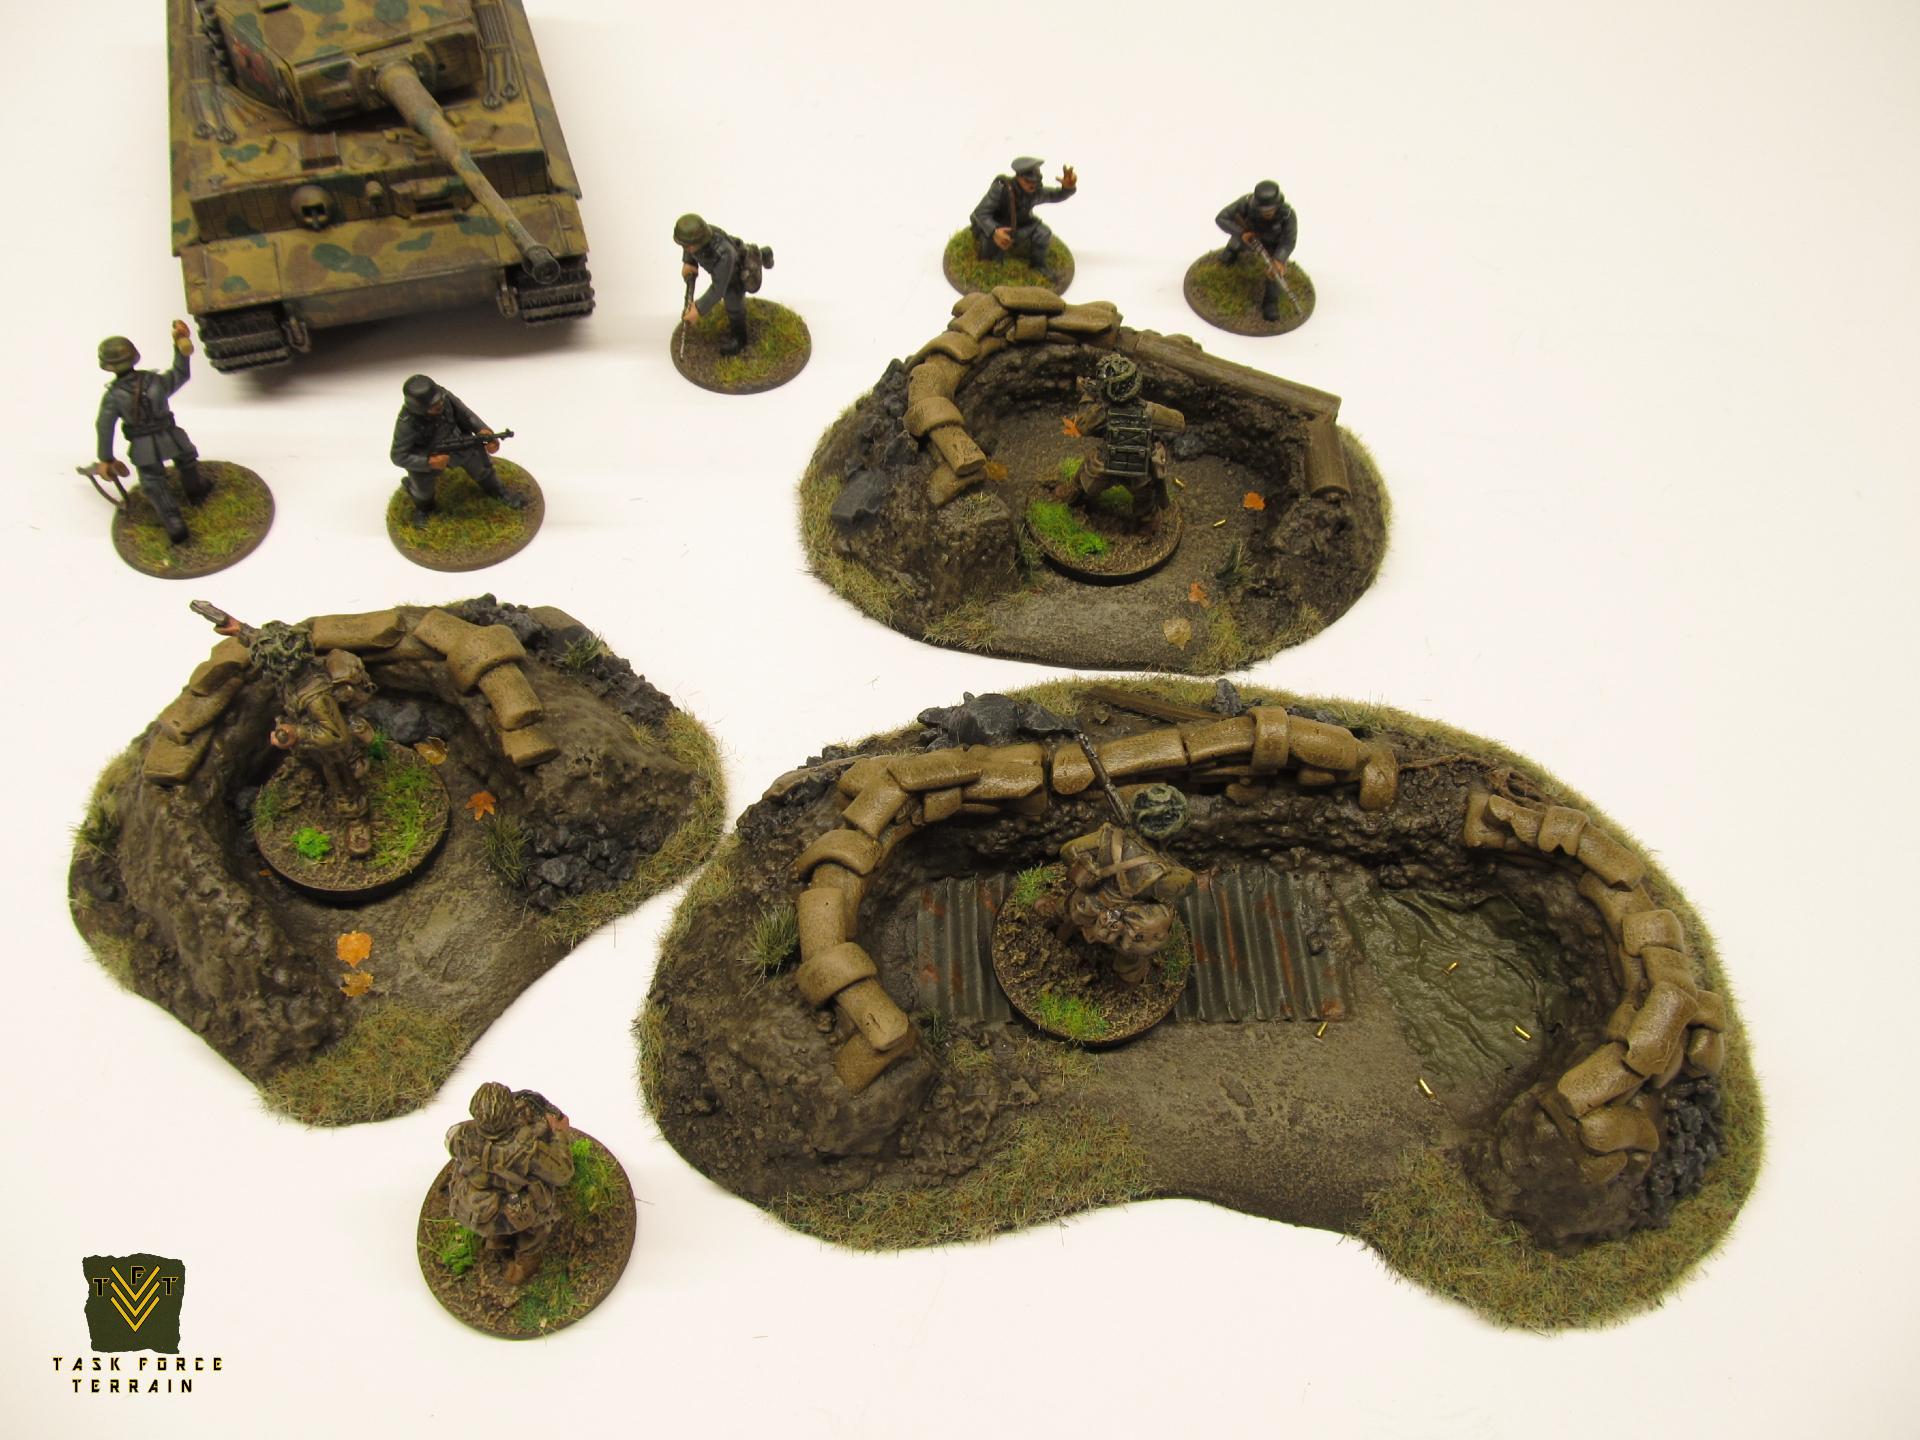 20mm, Buildings, Bunker, Foxholes, Positions, Sandbags, Terrain, Wargames Terrain, World War 2